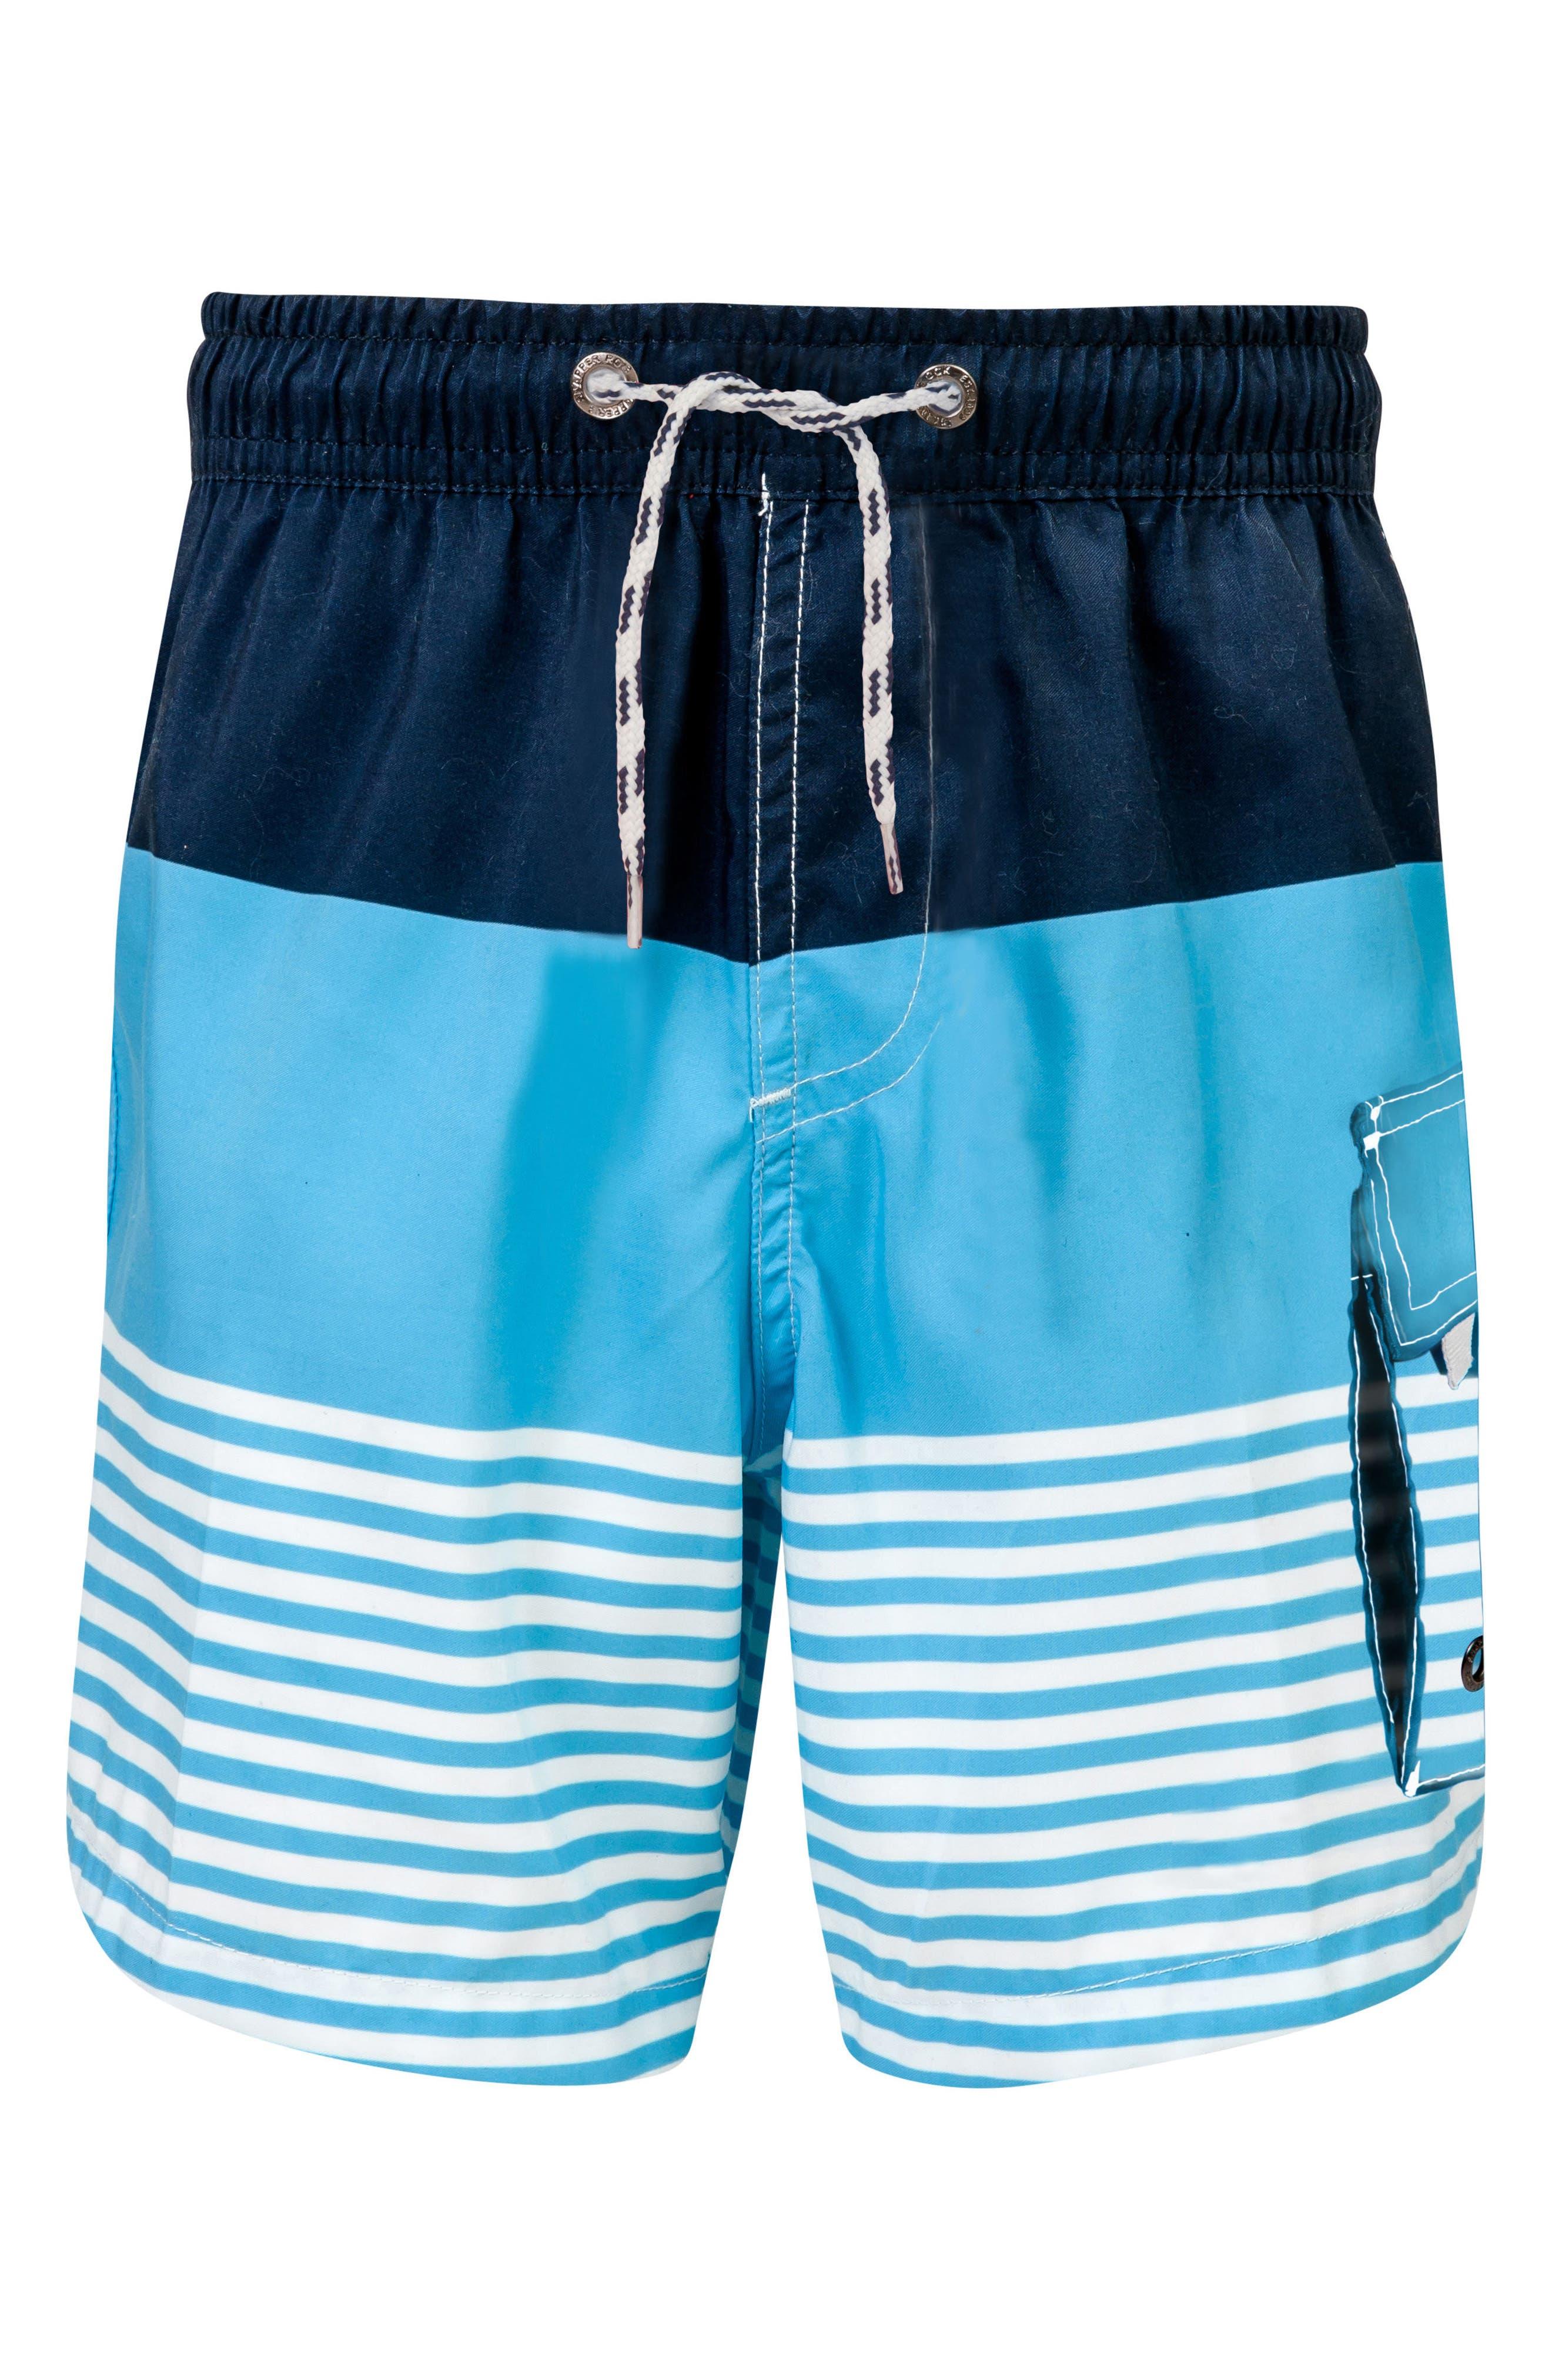 Main Image - Snapper Rock Stripe Board Shorts (Baby Boys, Toddler Boys & Little Boys)